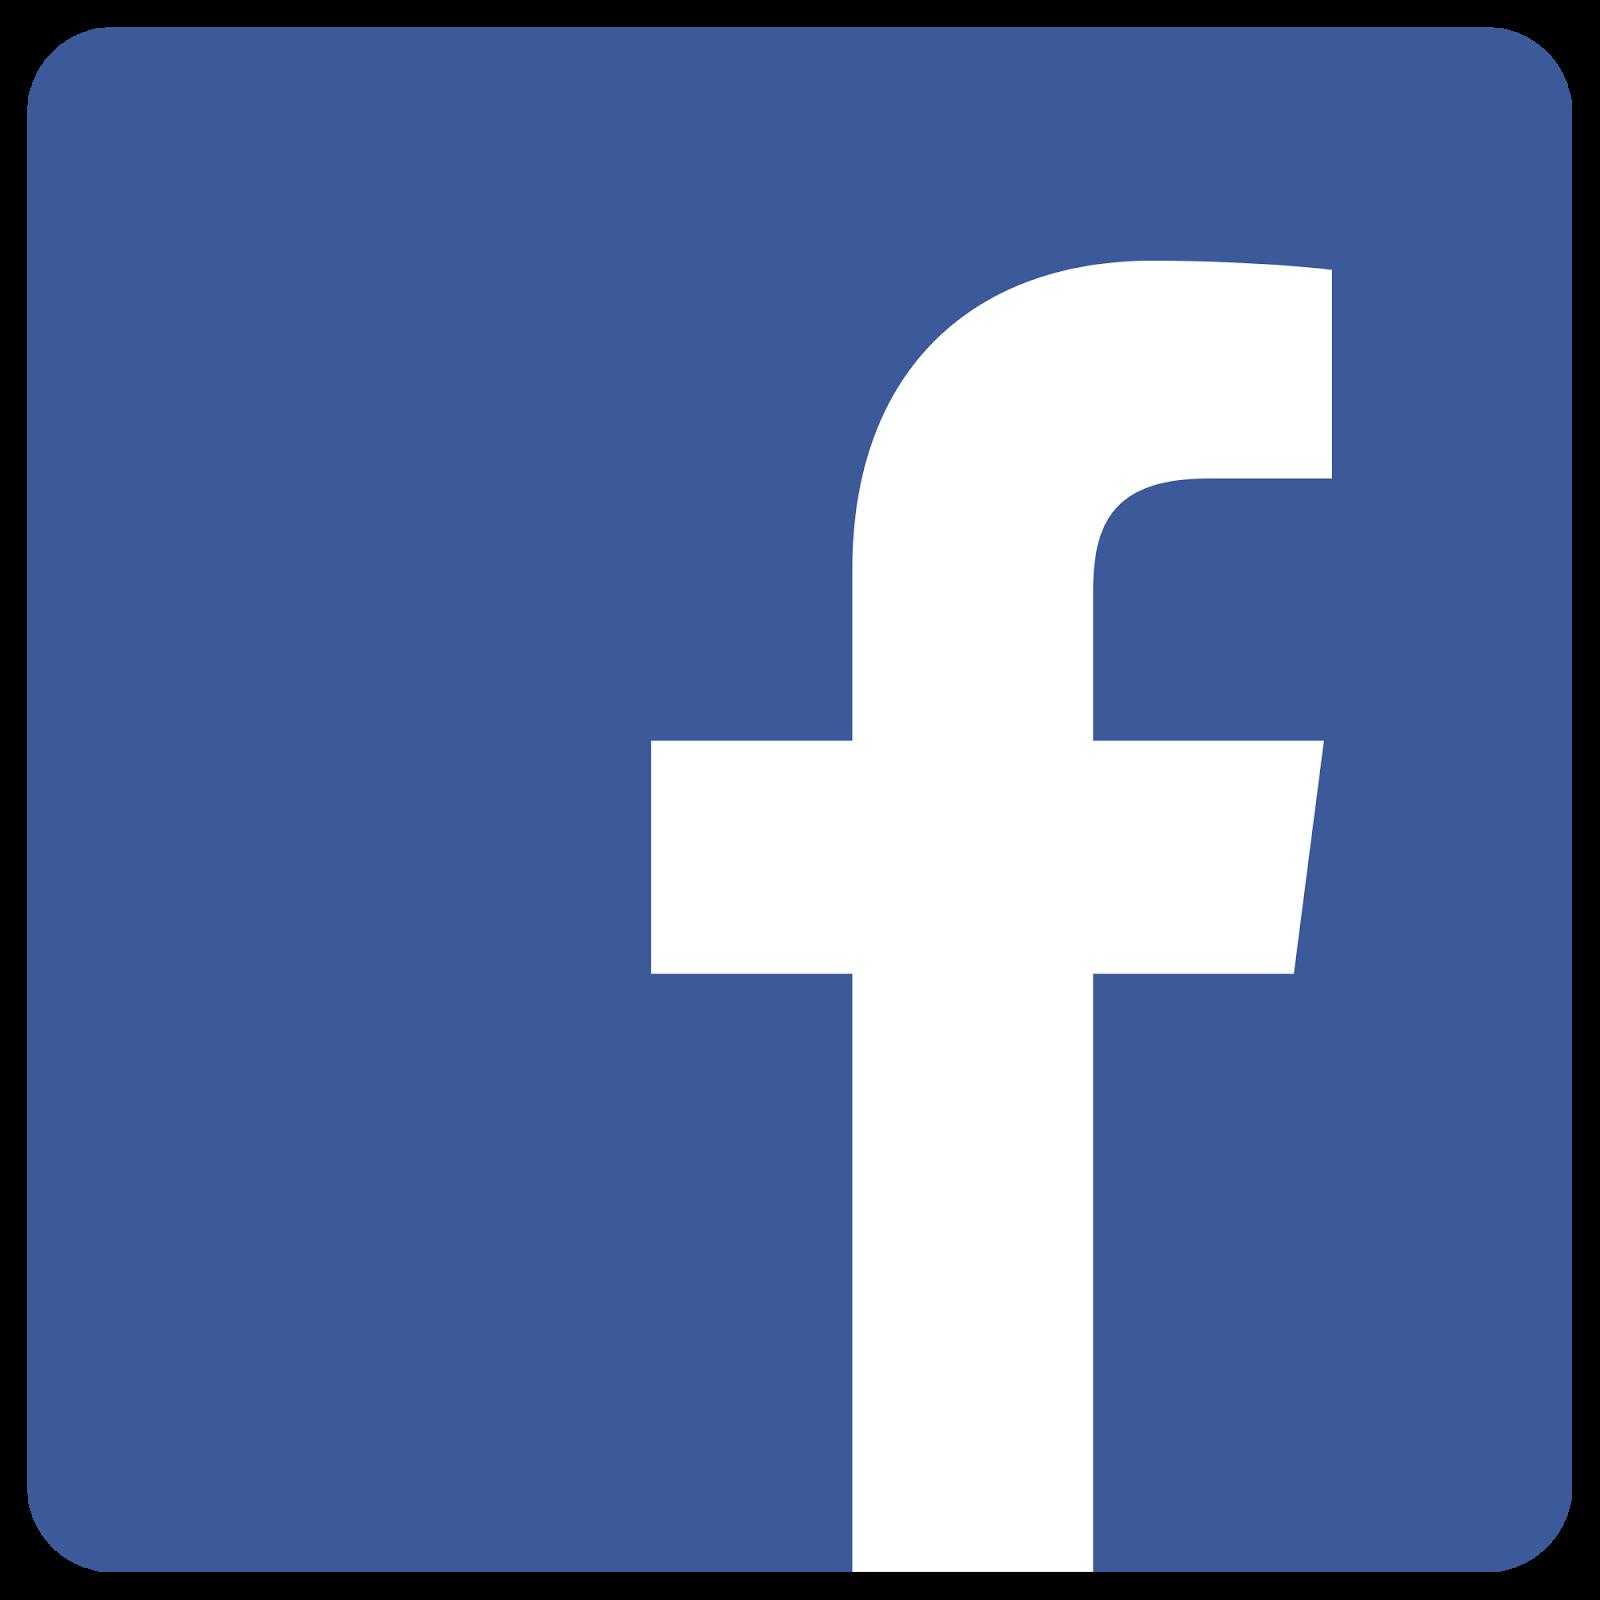 facebook_v2_1600